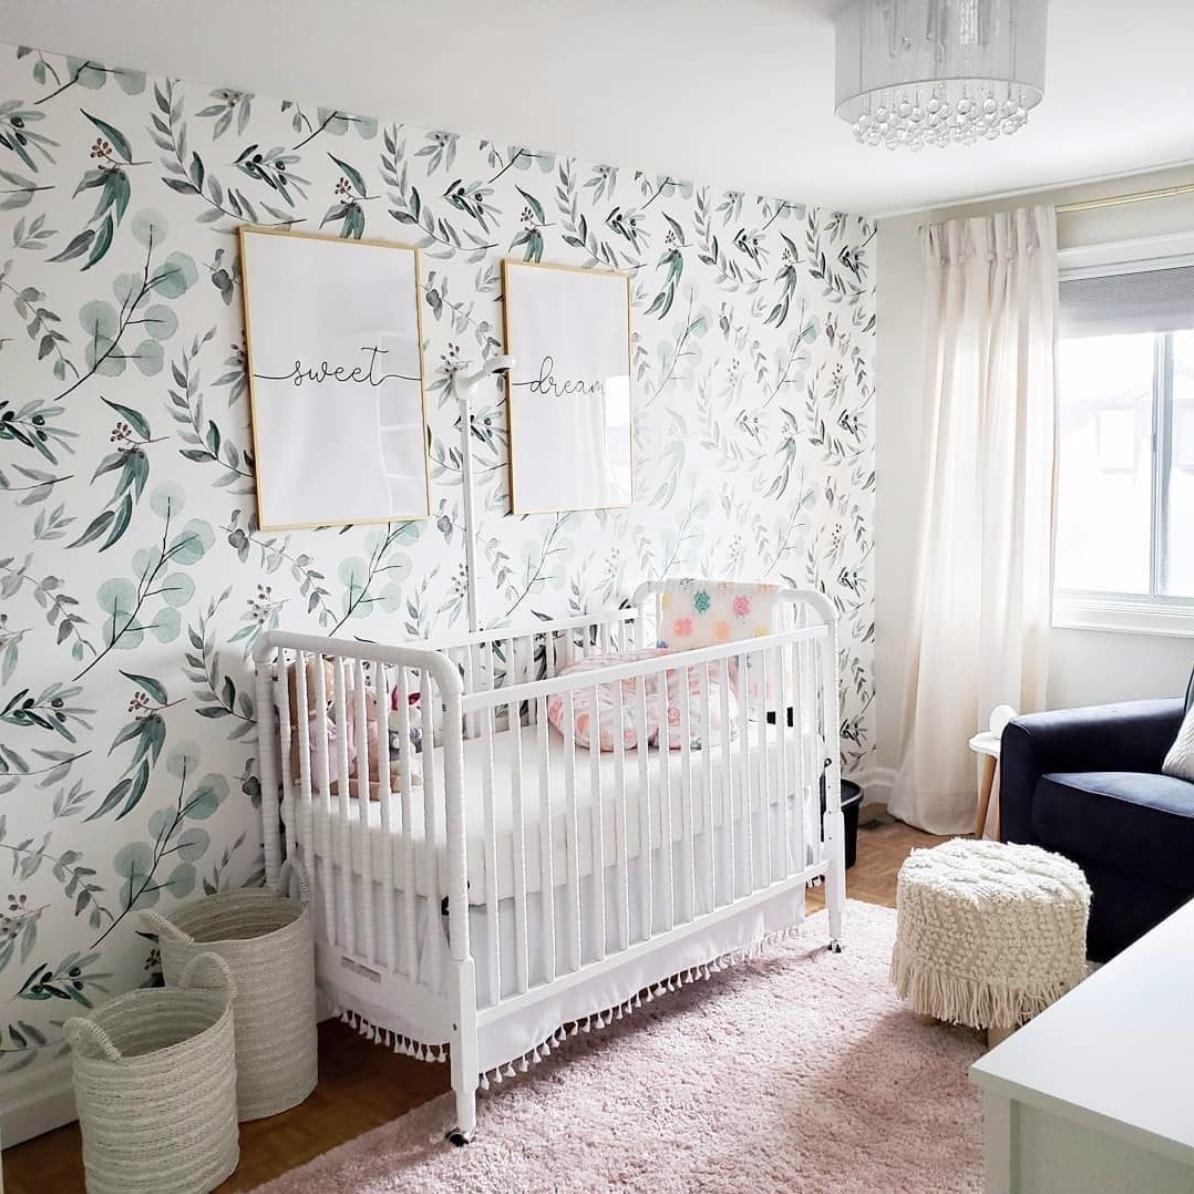 Botanical Wallpaper in Girls Nursery Design: @chloekdesign 2020 Nursery Trends: Botanicals